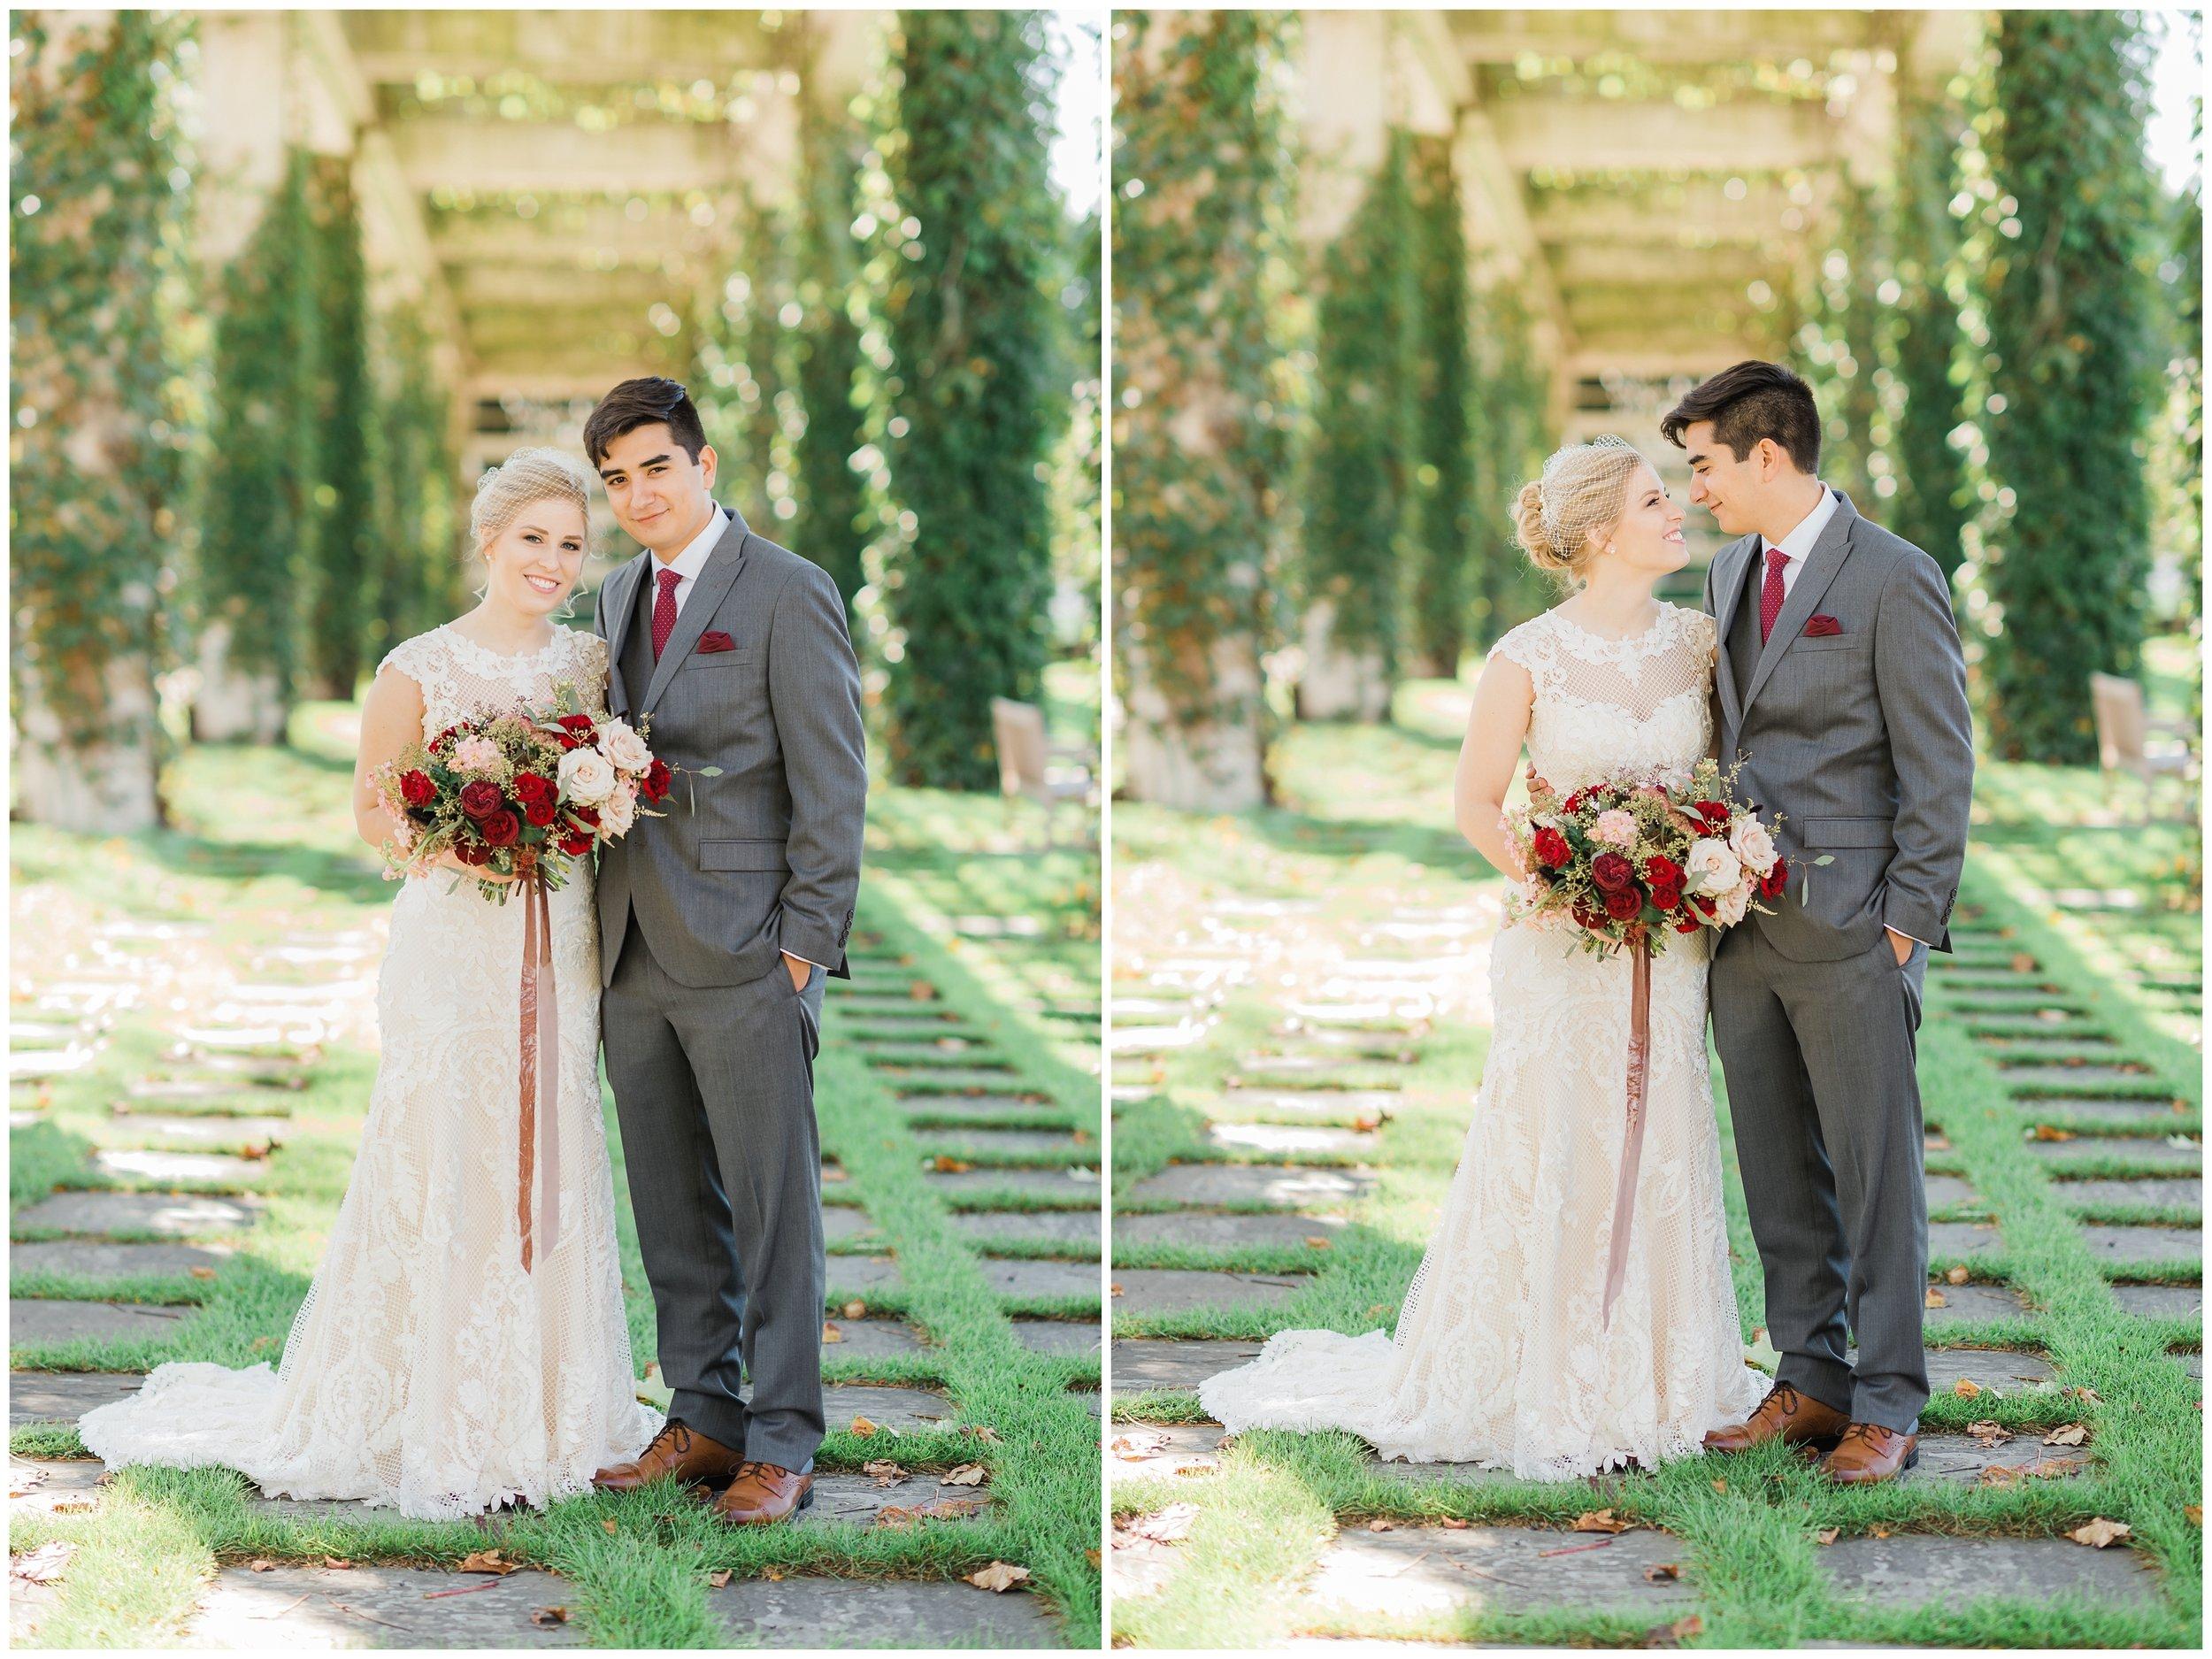 Rebecca_Shehorn_Photography_Indianapolis_Wedding_Photographer_7312.jpg